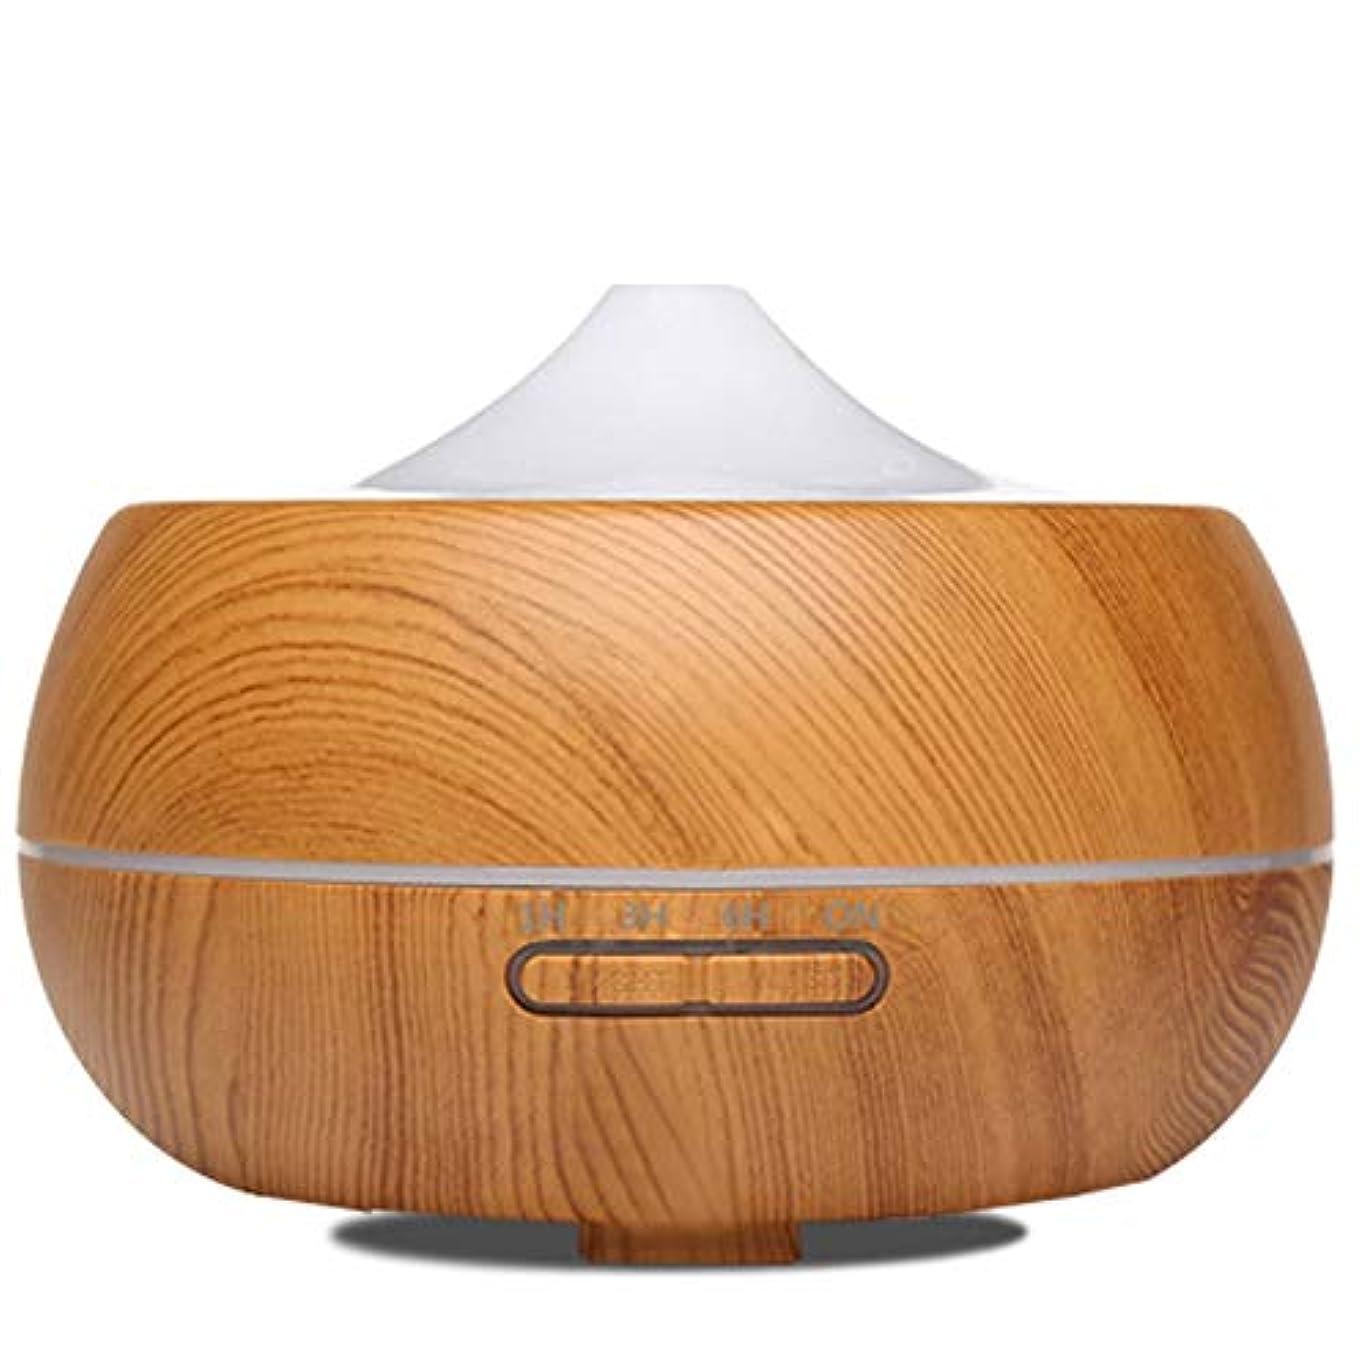 300 ml アロマテラピー エッセンシャル オイル ディフューザー, 超音波 涼しい霧 humidmifier アロマディフューザー タイマー付き 7色変換 夜のライト 空焚き防止機能搭載- 17x12cm